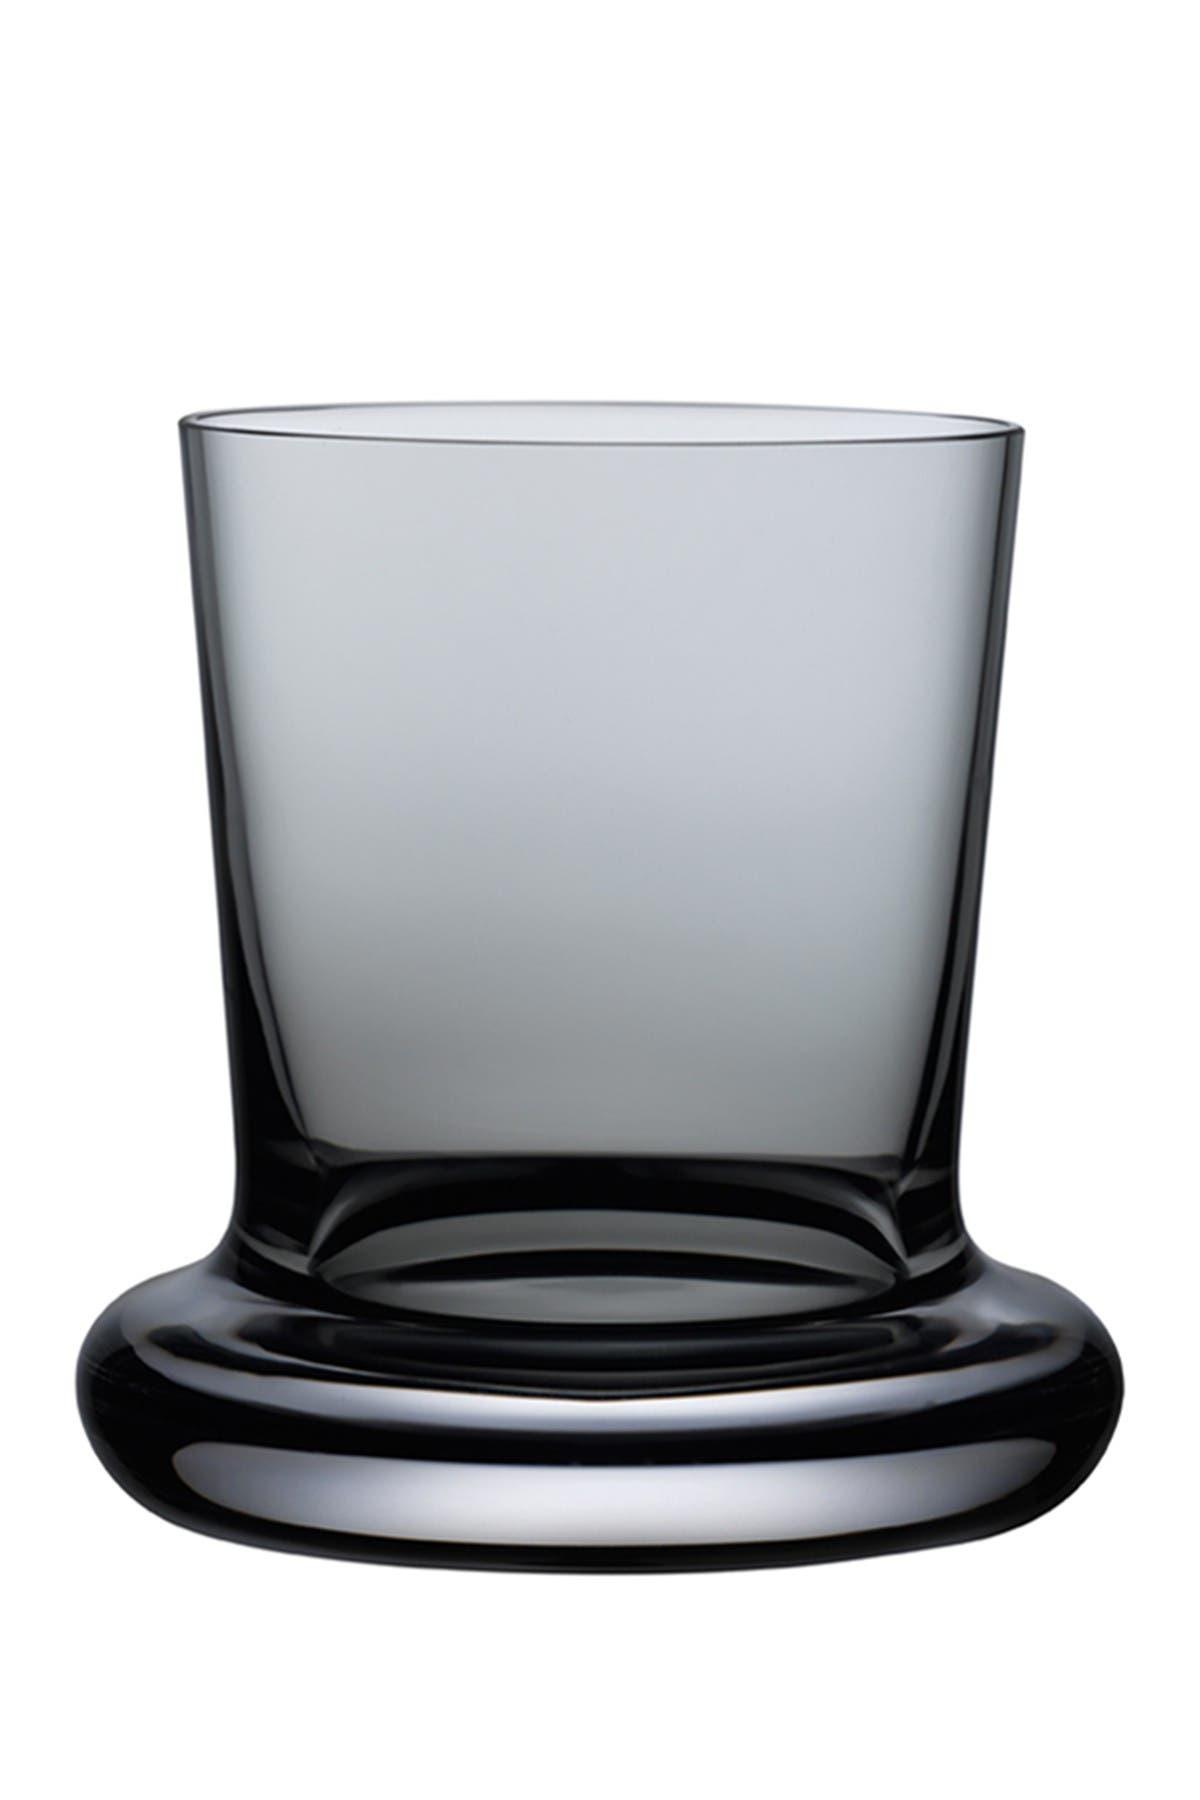 Image of Nude Glass Stamp Tumbler Glasses - Smoke - Set of 2